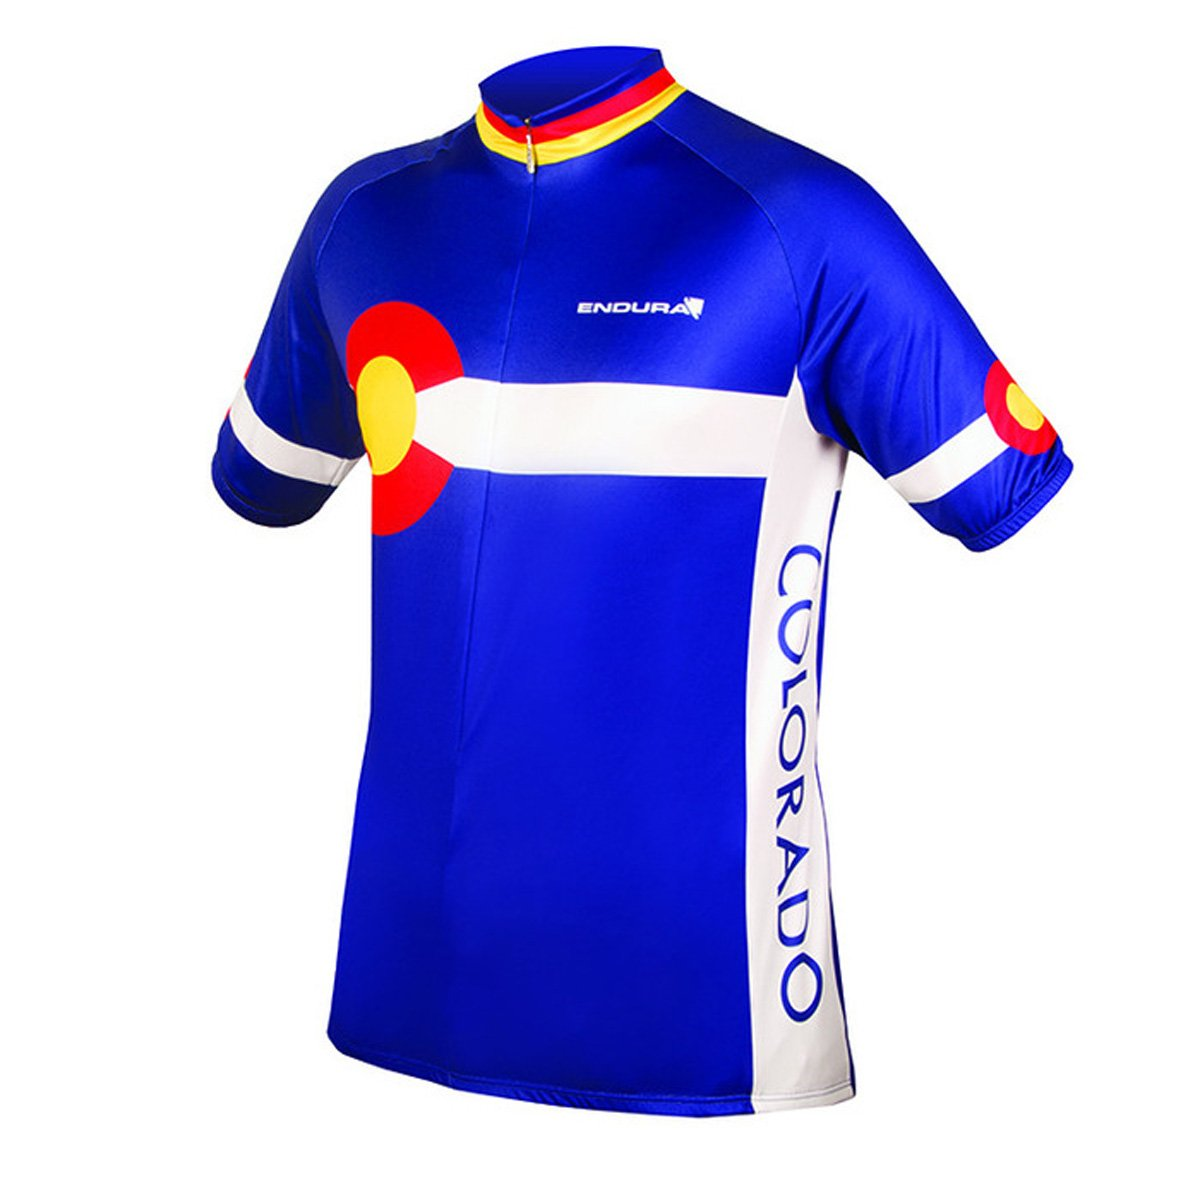 Endura Colorado II Short Sleeve Cycling Jersey B072855HBF Small|ブルー ブルー Small